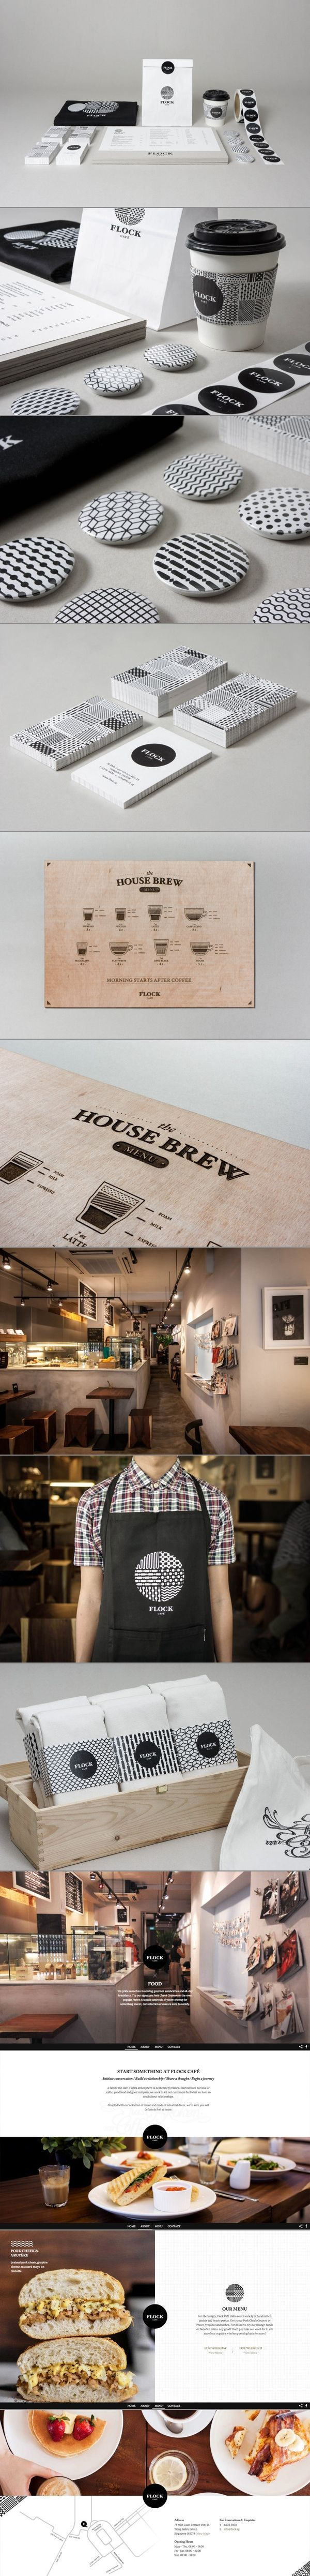 Flock Café by Kilo Studio, via Behance | Marketing  Design | Pintere…